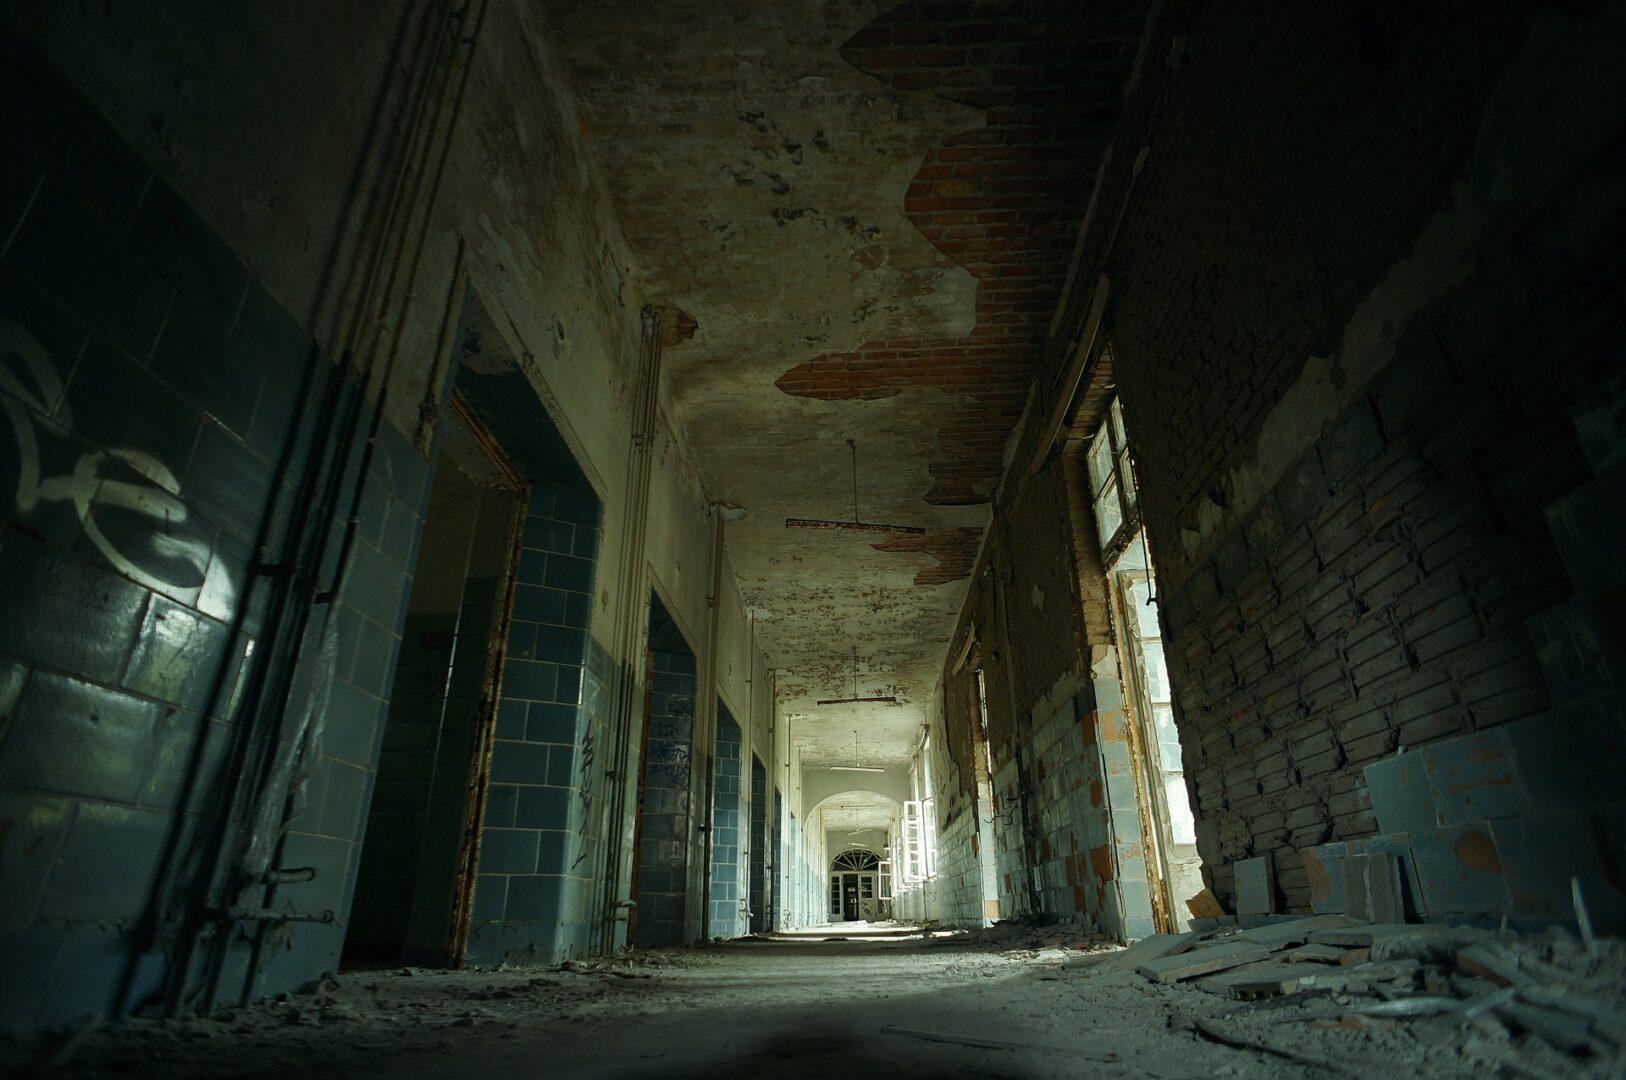 Urbex | Abandoned Places | Photography | Exploration